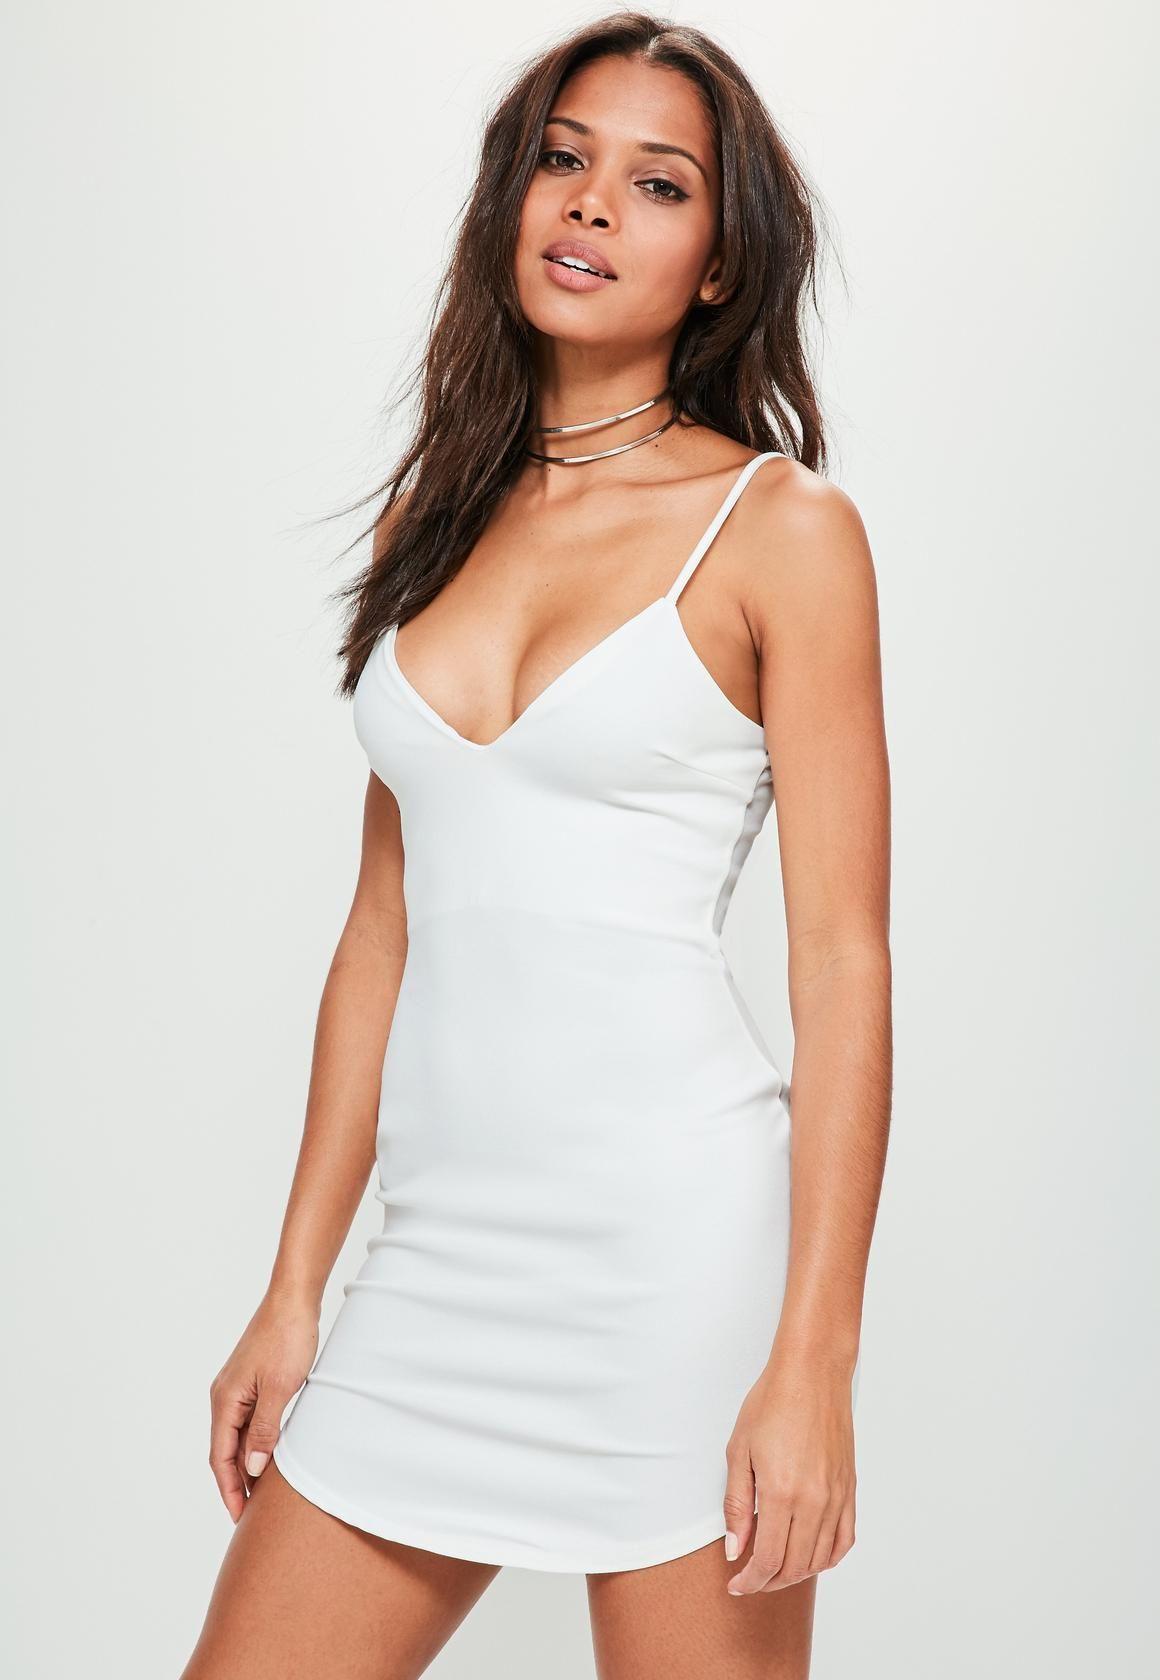 Missguided Strappy Plunge Bodycon Dress White White Short Dress Plunge Bodycon Dress Women Dress Online [ 1680 x 1160 Pixel ]